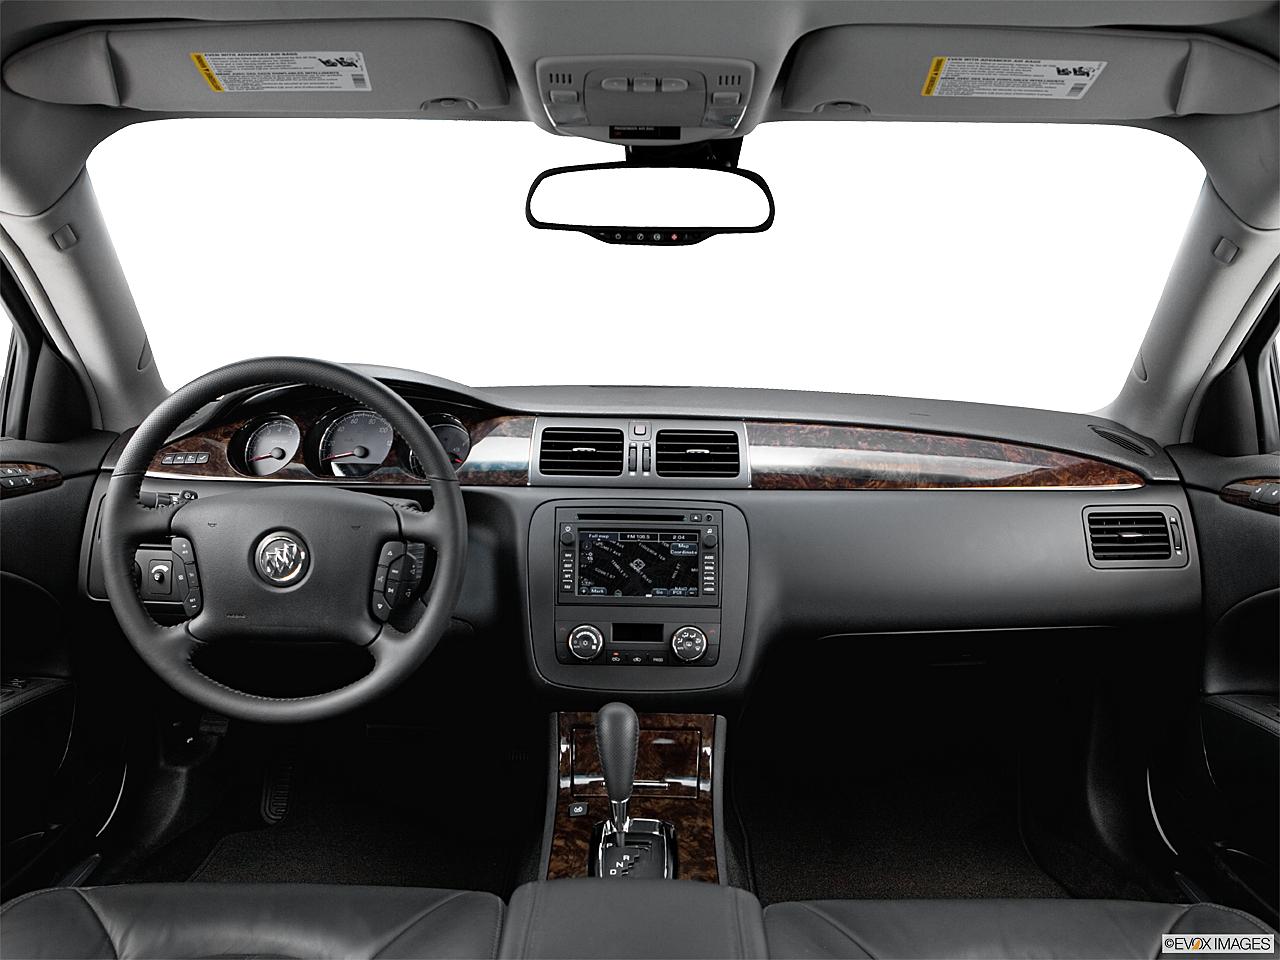 Buick Lucerne Cx Dr Sedan Large on 2007 Buick Lacrosse Cx Manual